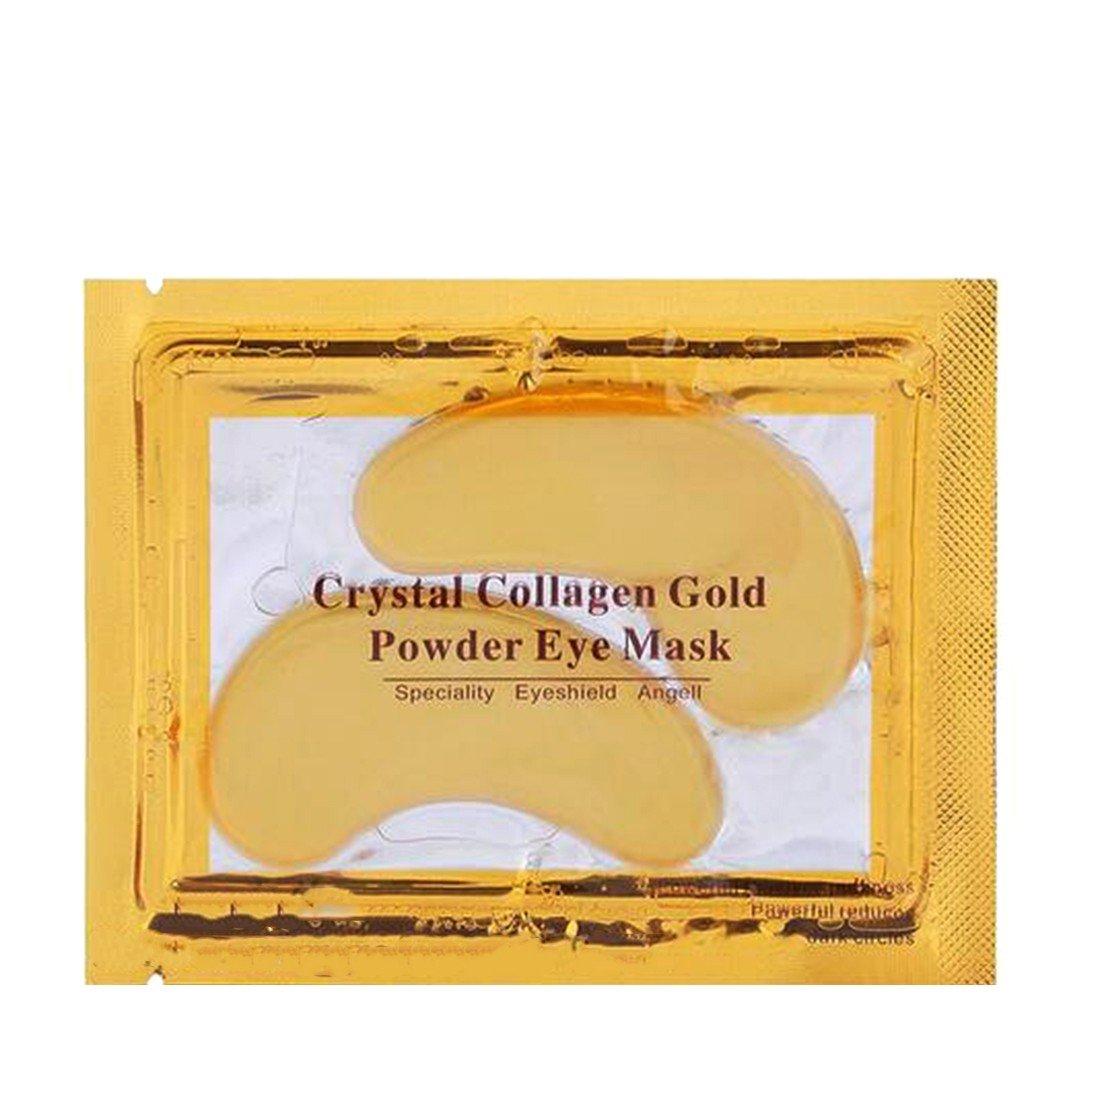 Bequeme Frauen 10pcs Goldkristallkollagen Augen Schablonen Augen Patches Skin Care CY-Buity